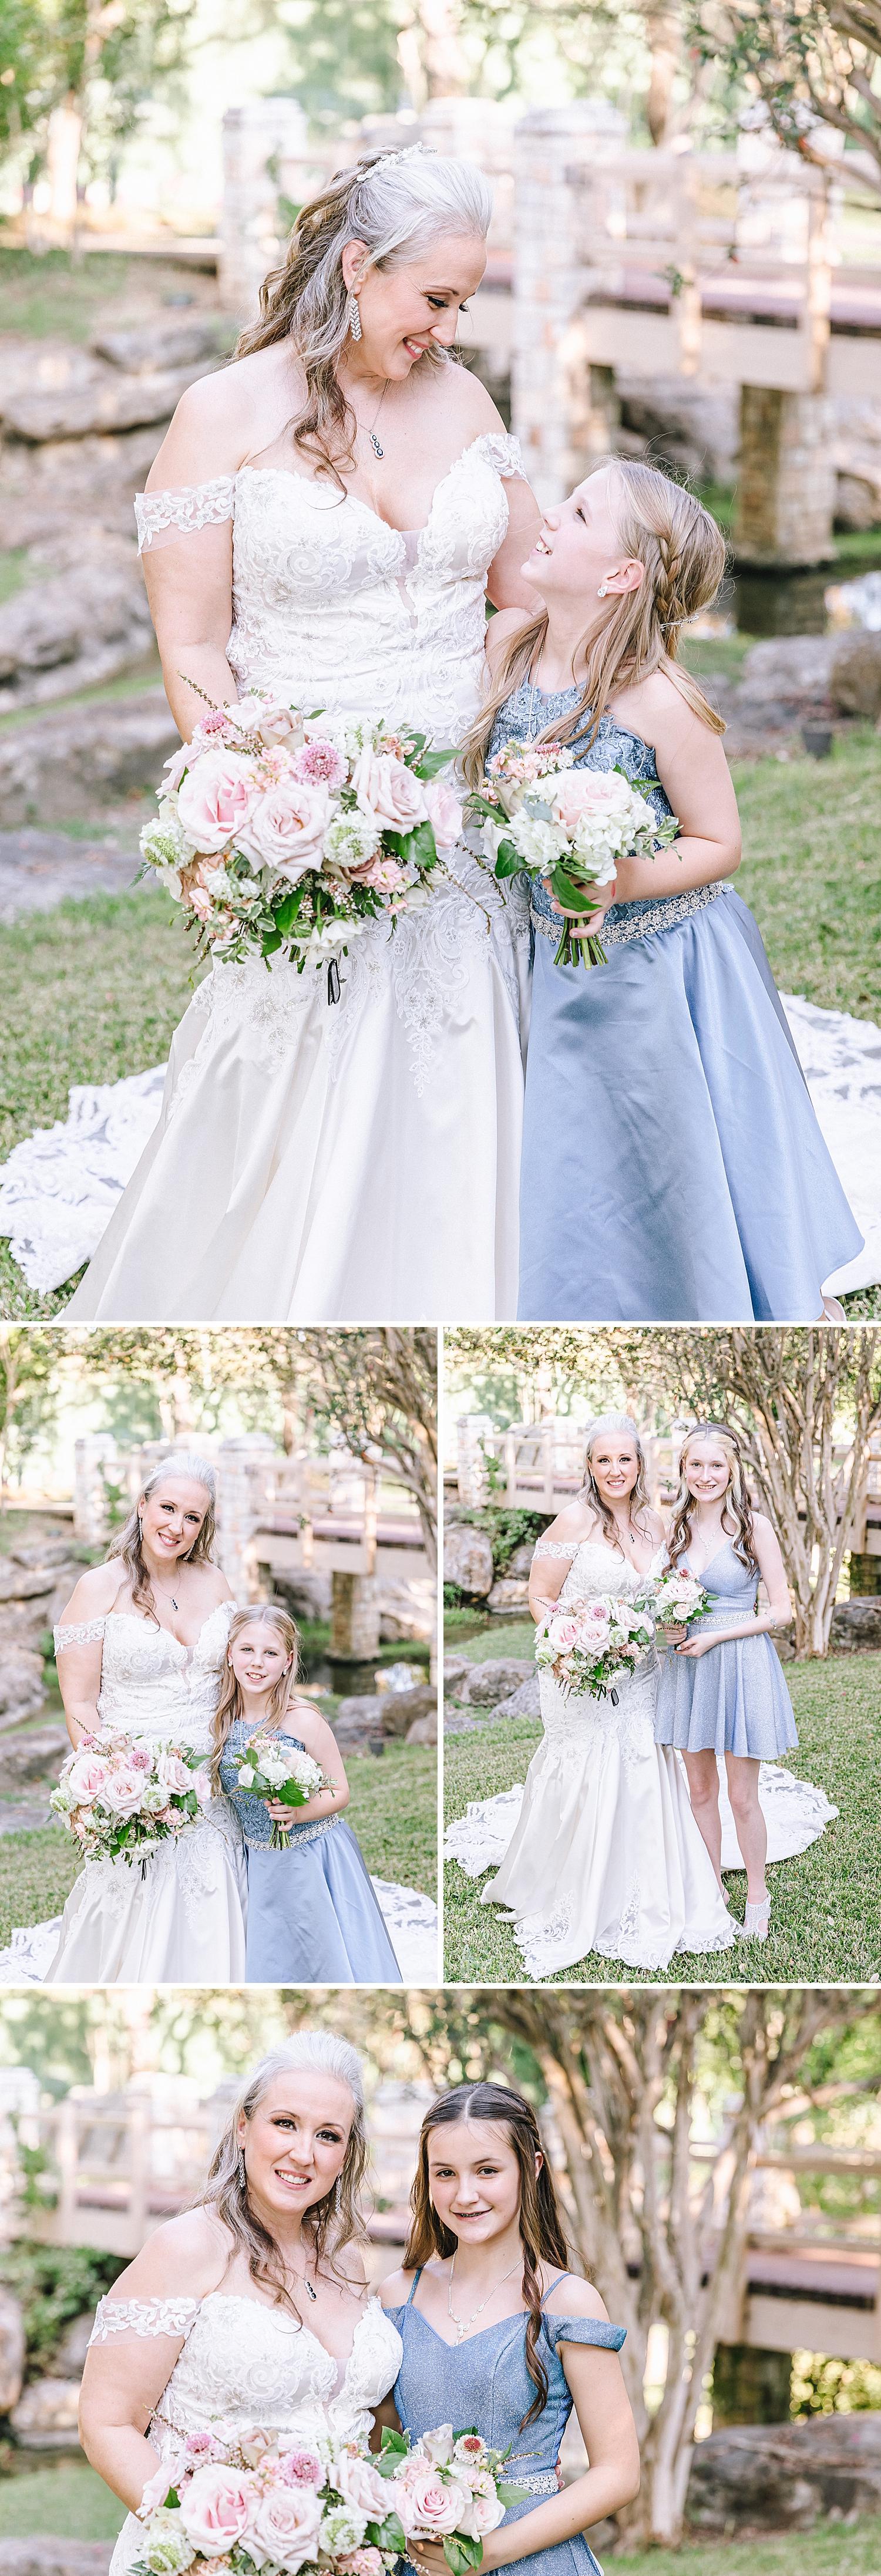 The-Club-at-Garden-Ridge-Military-Wedding-Carly-Barton-Photography_0073.jpg